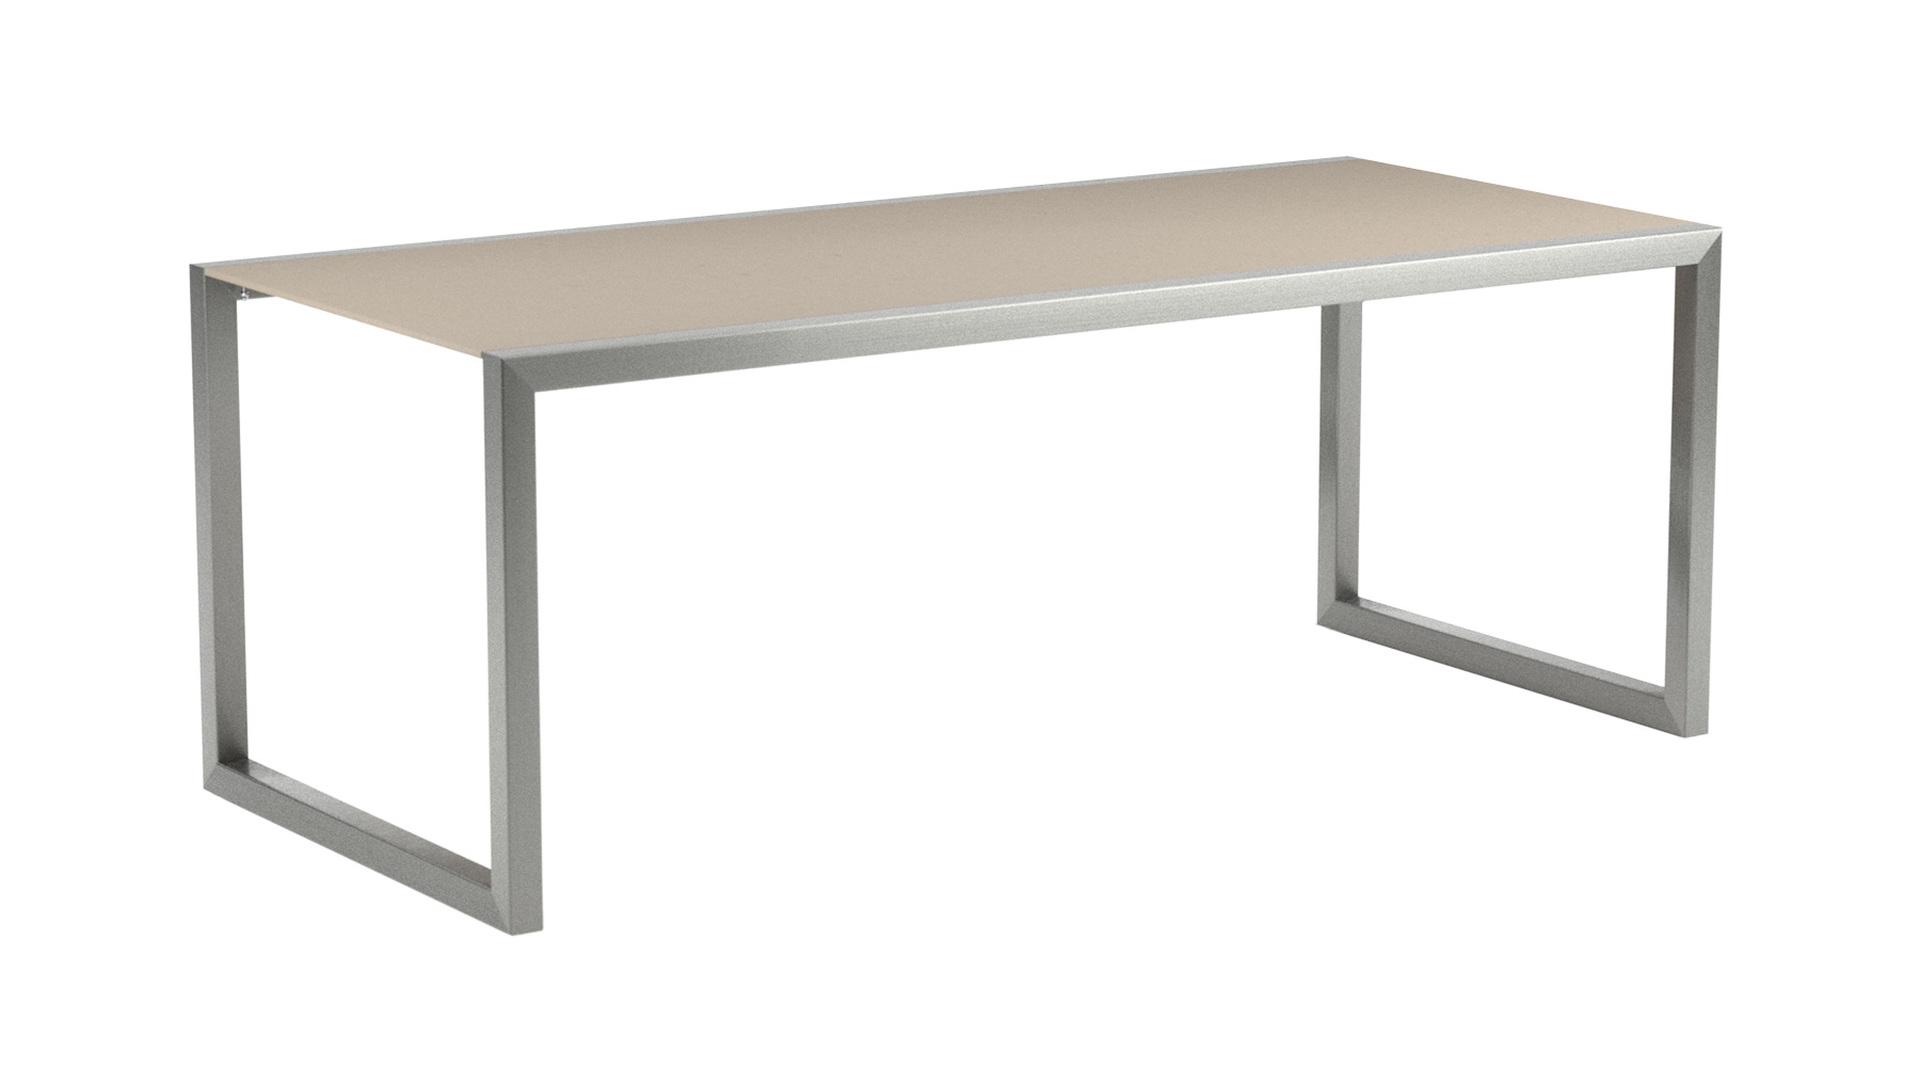 Ninix 200 table RVS-clu royal botania.jpg